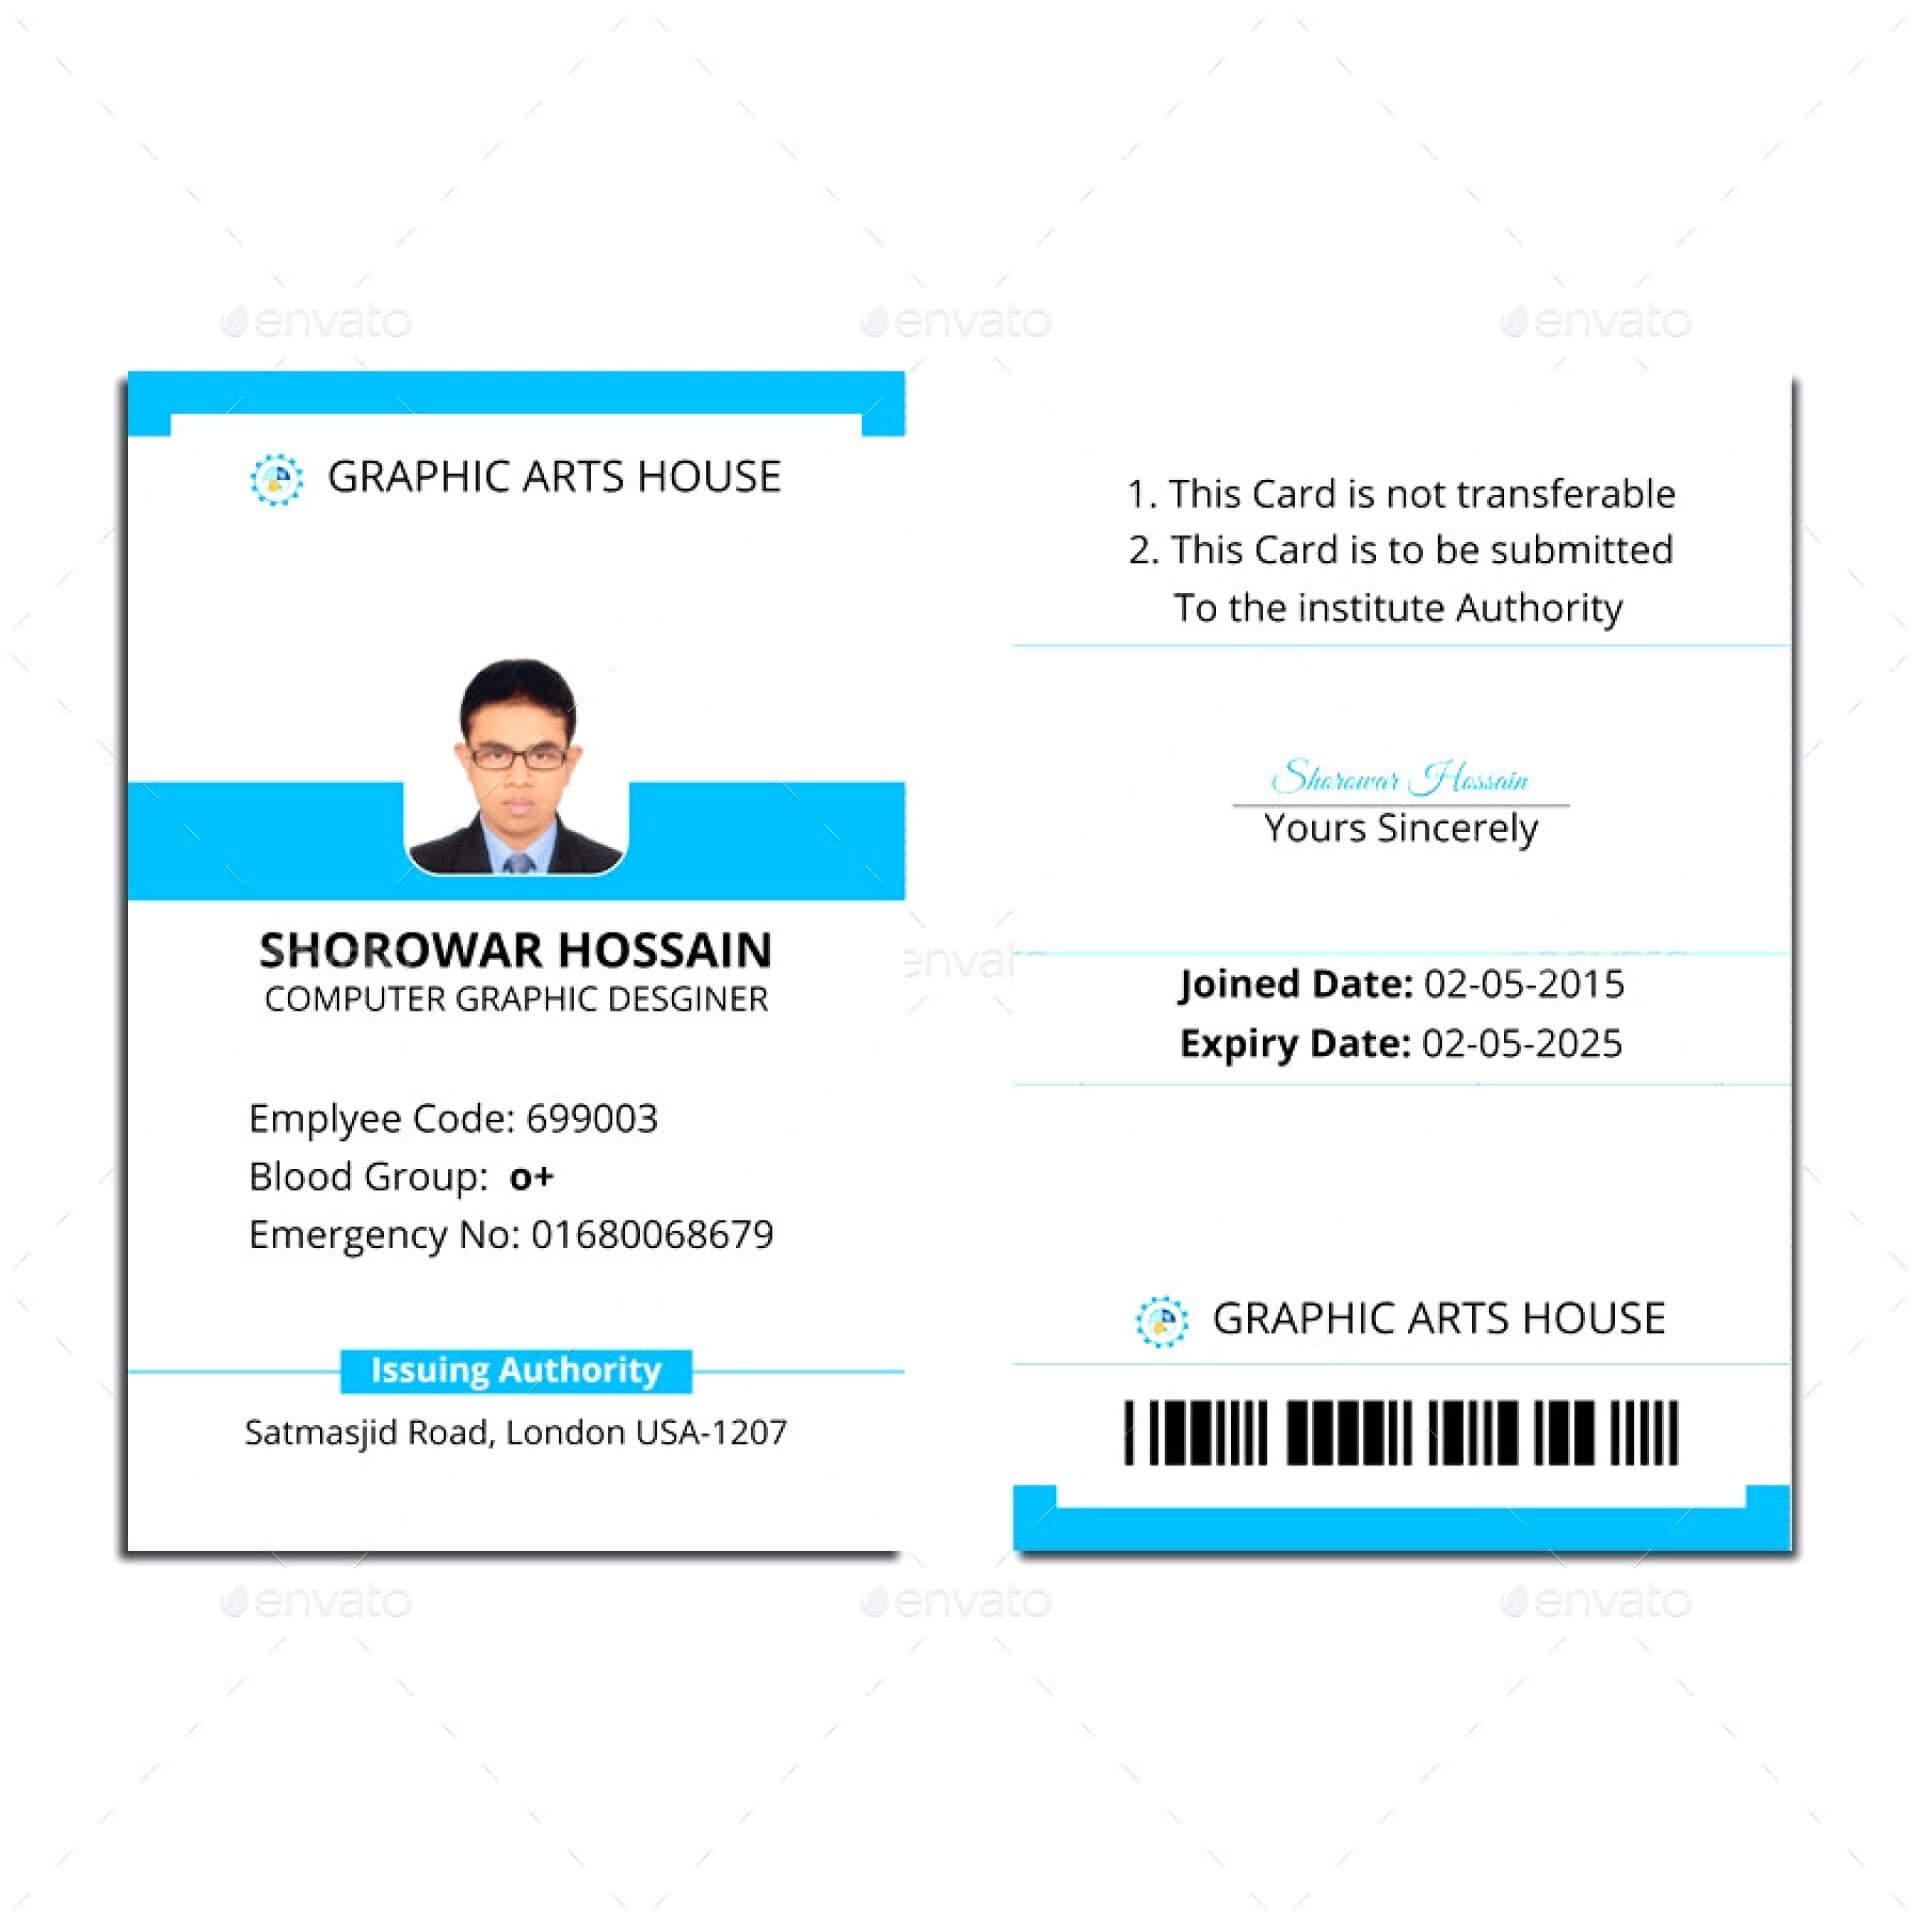 009 Id Badge Template Free Word Card Ideas Unforgettable For Throughout Id Badge Template Word